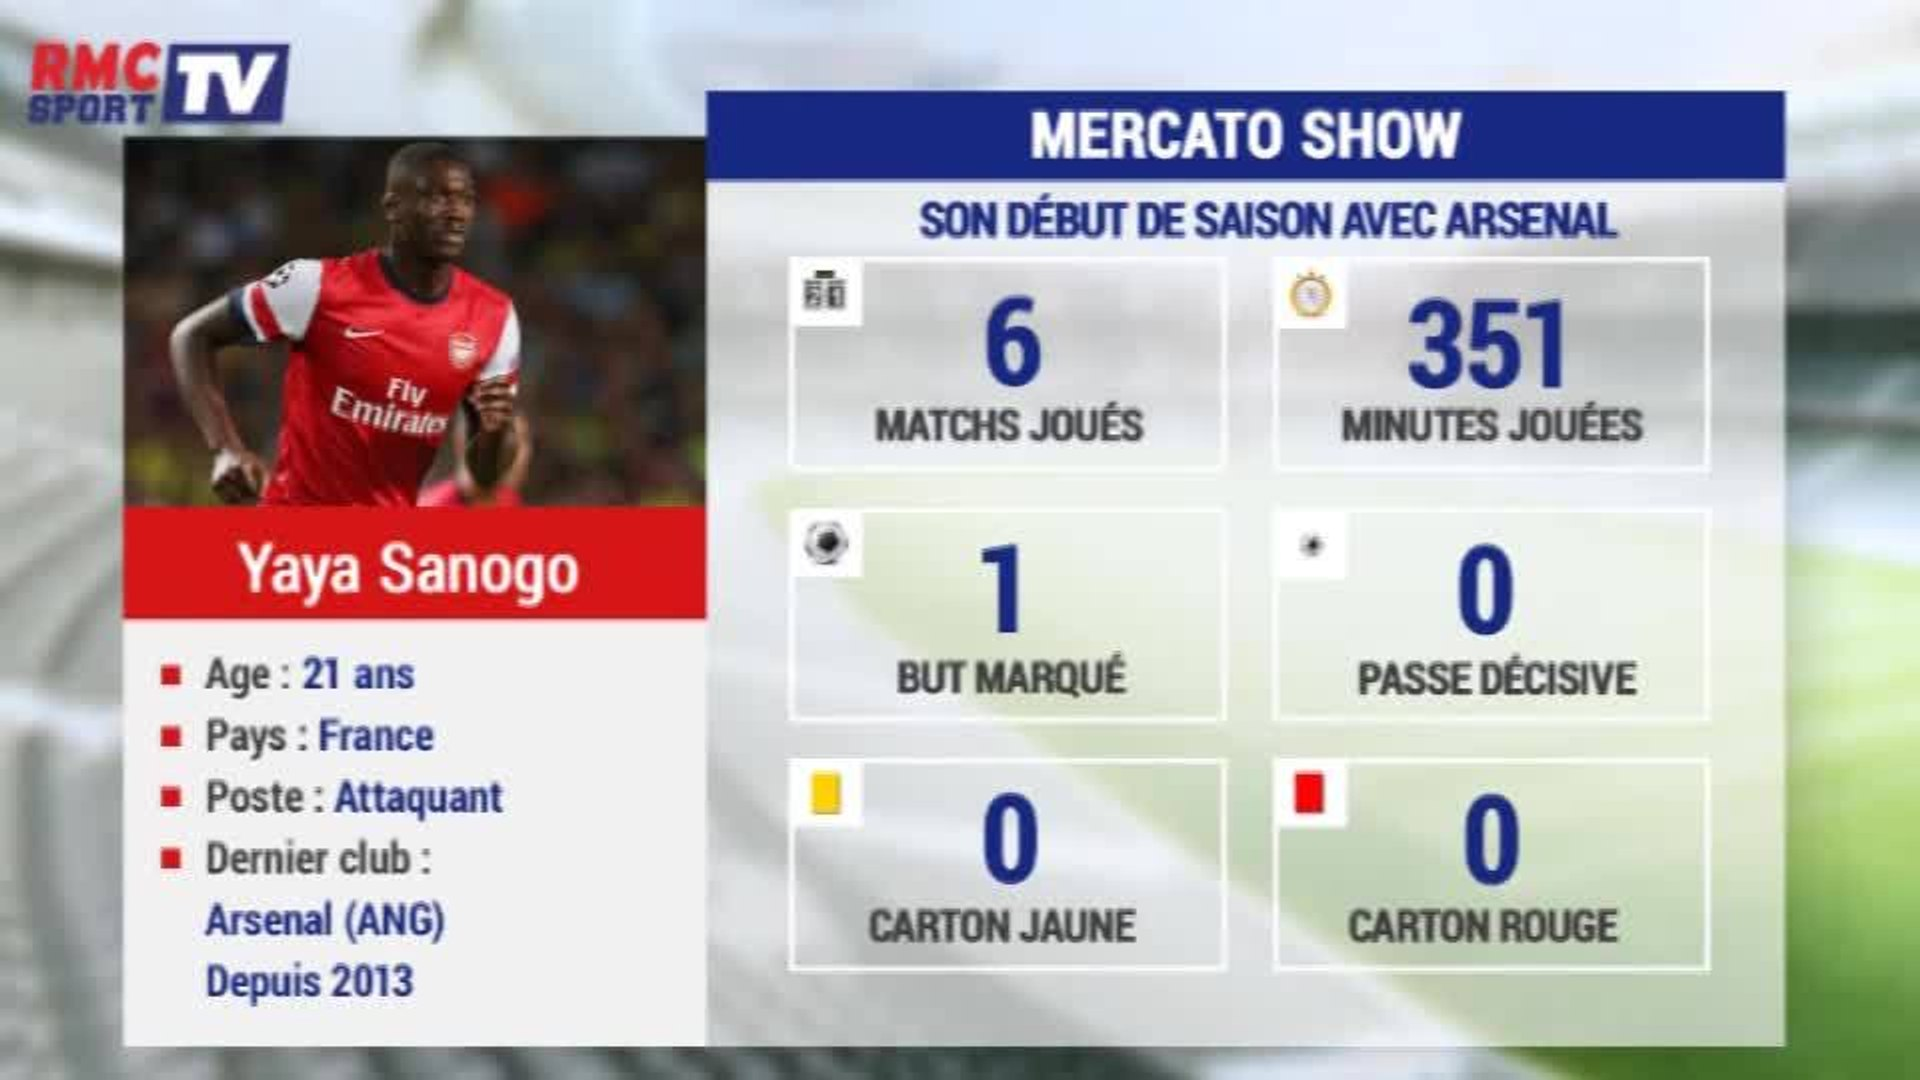 Mercato Show / La fiche transfert de Yaya Sanogo à Crystal Palace - 13/01